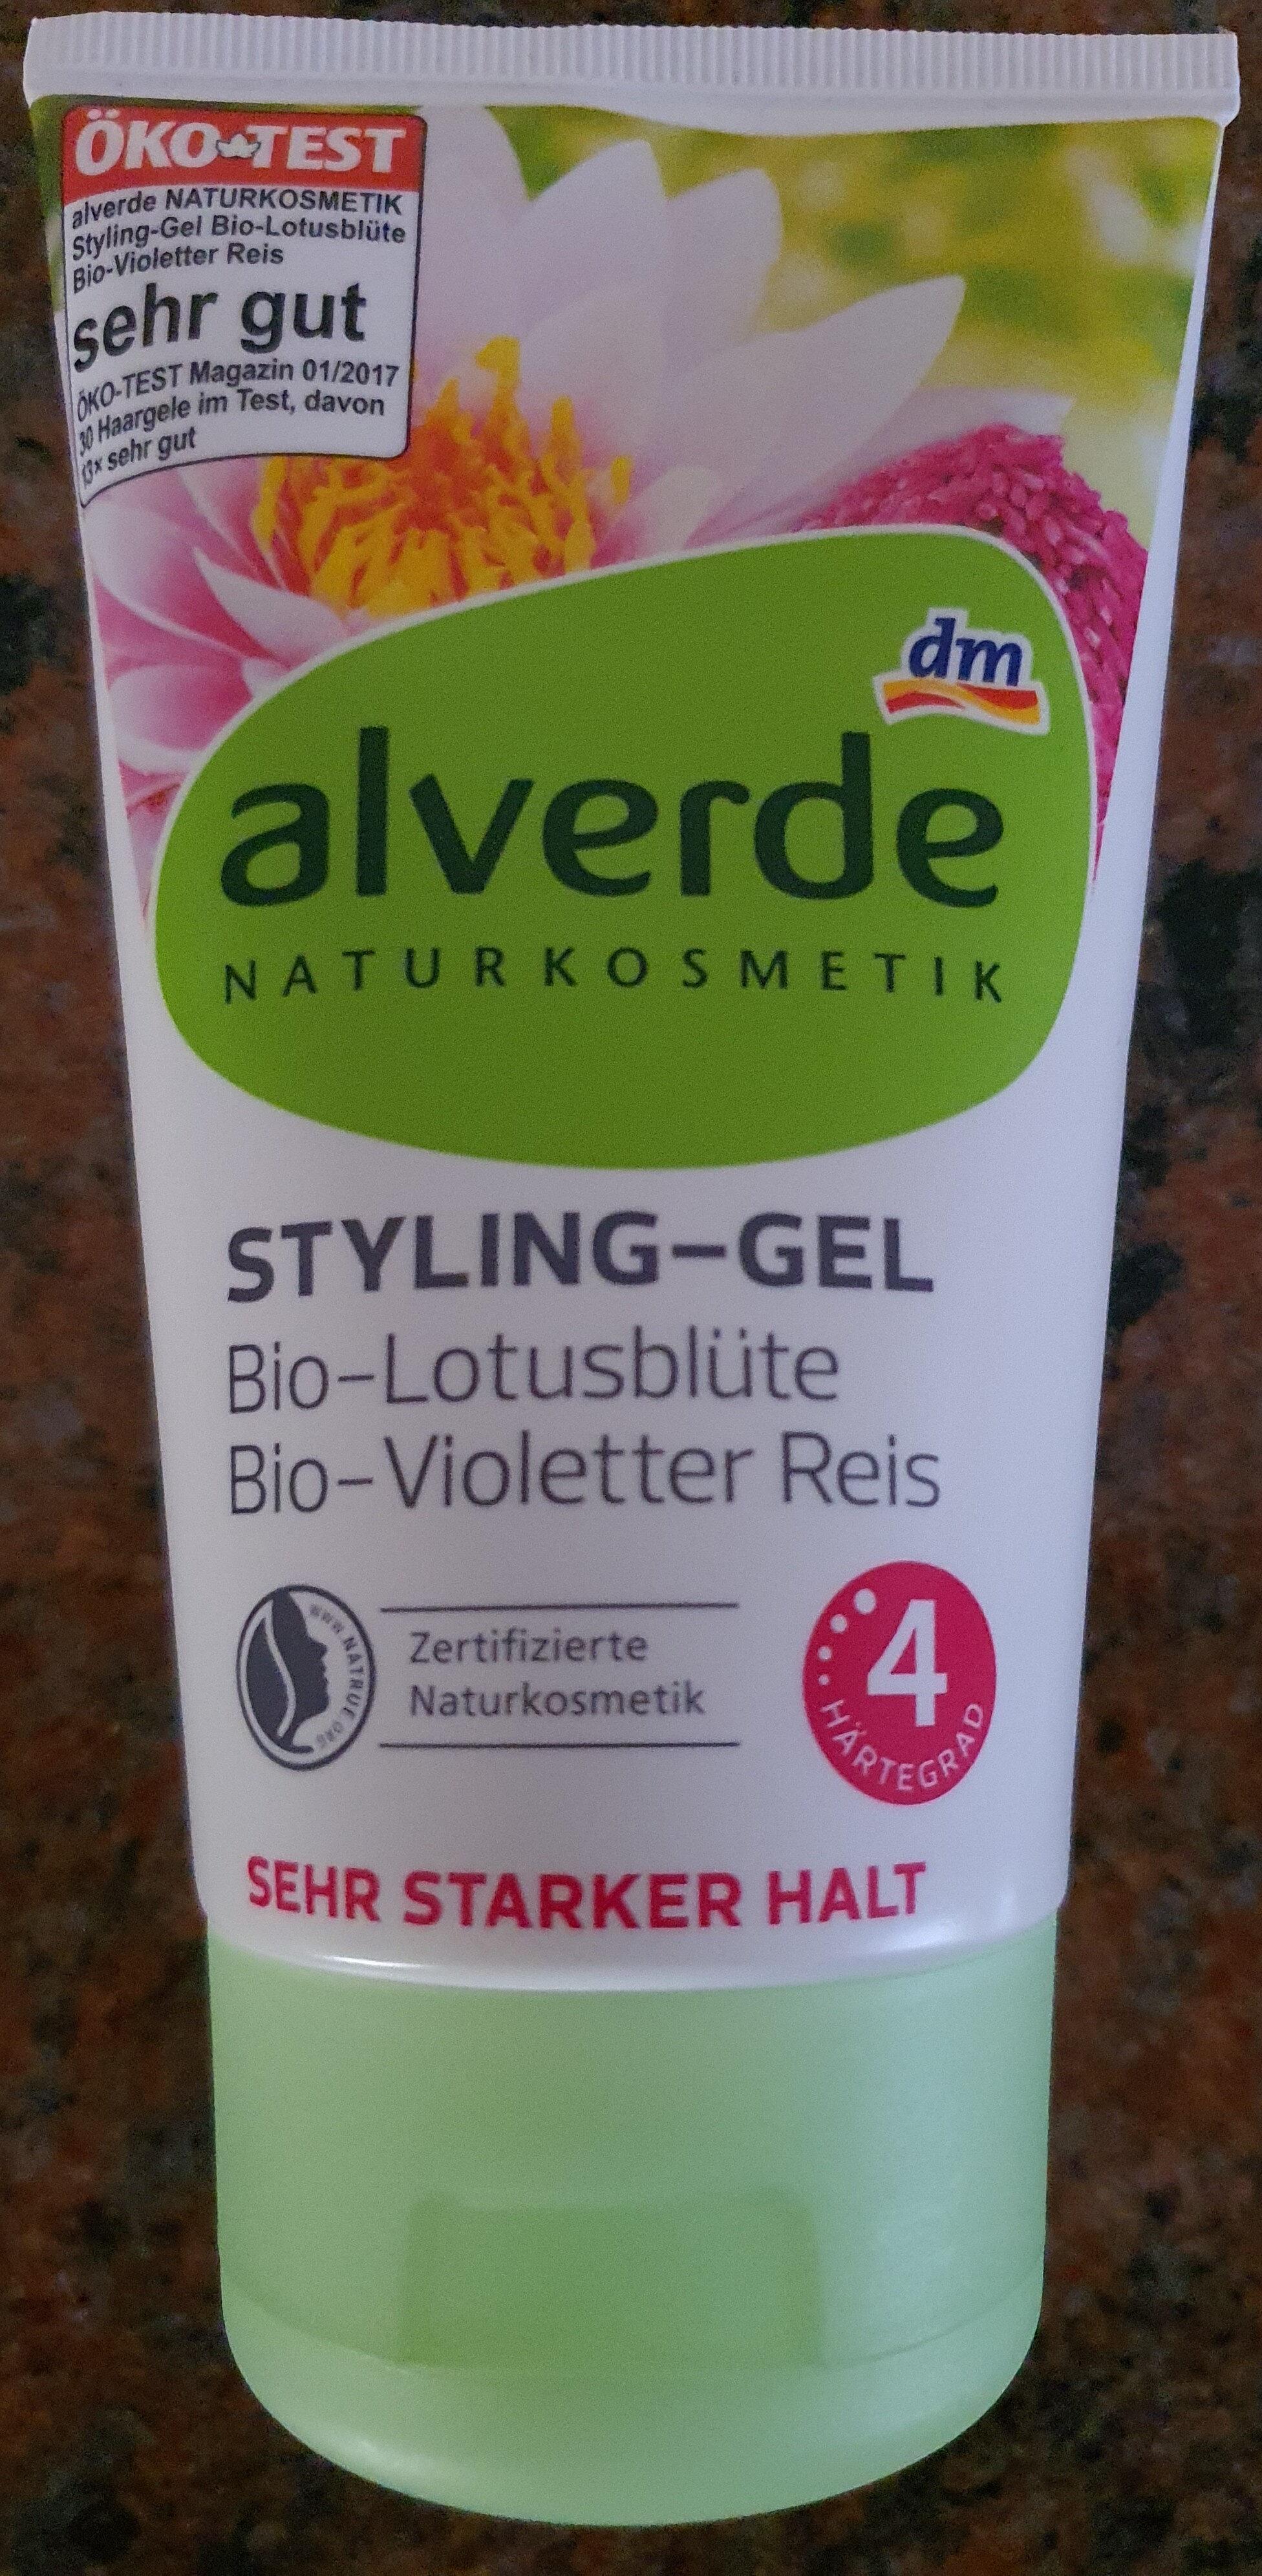 Styling-Gel Bio-Lotusblüte Bio-Violetter Reis - Product - de